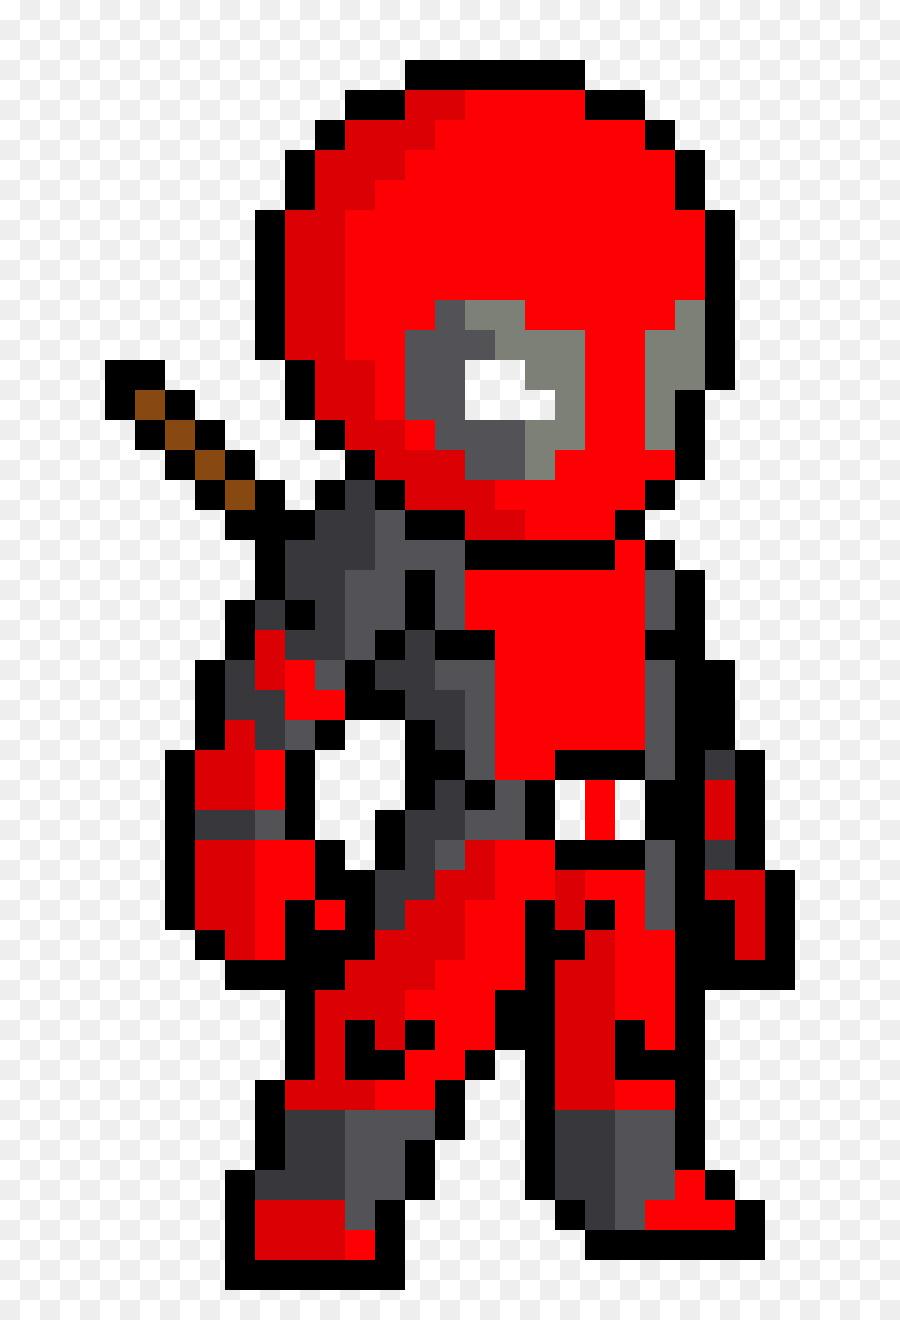 minecraft deadpool pixel art drawing pixel png download 810 1320